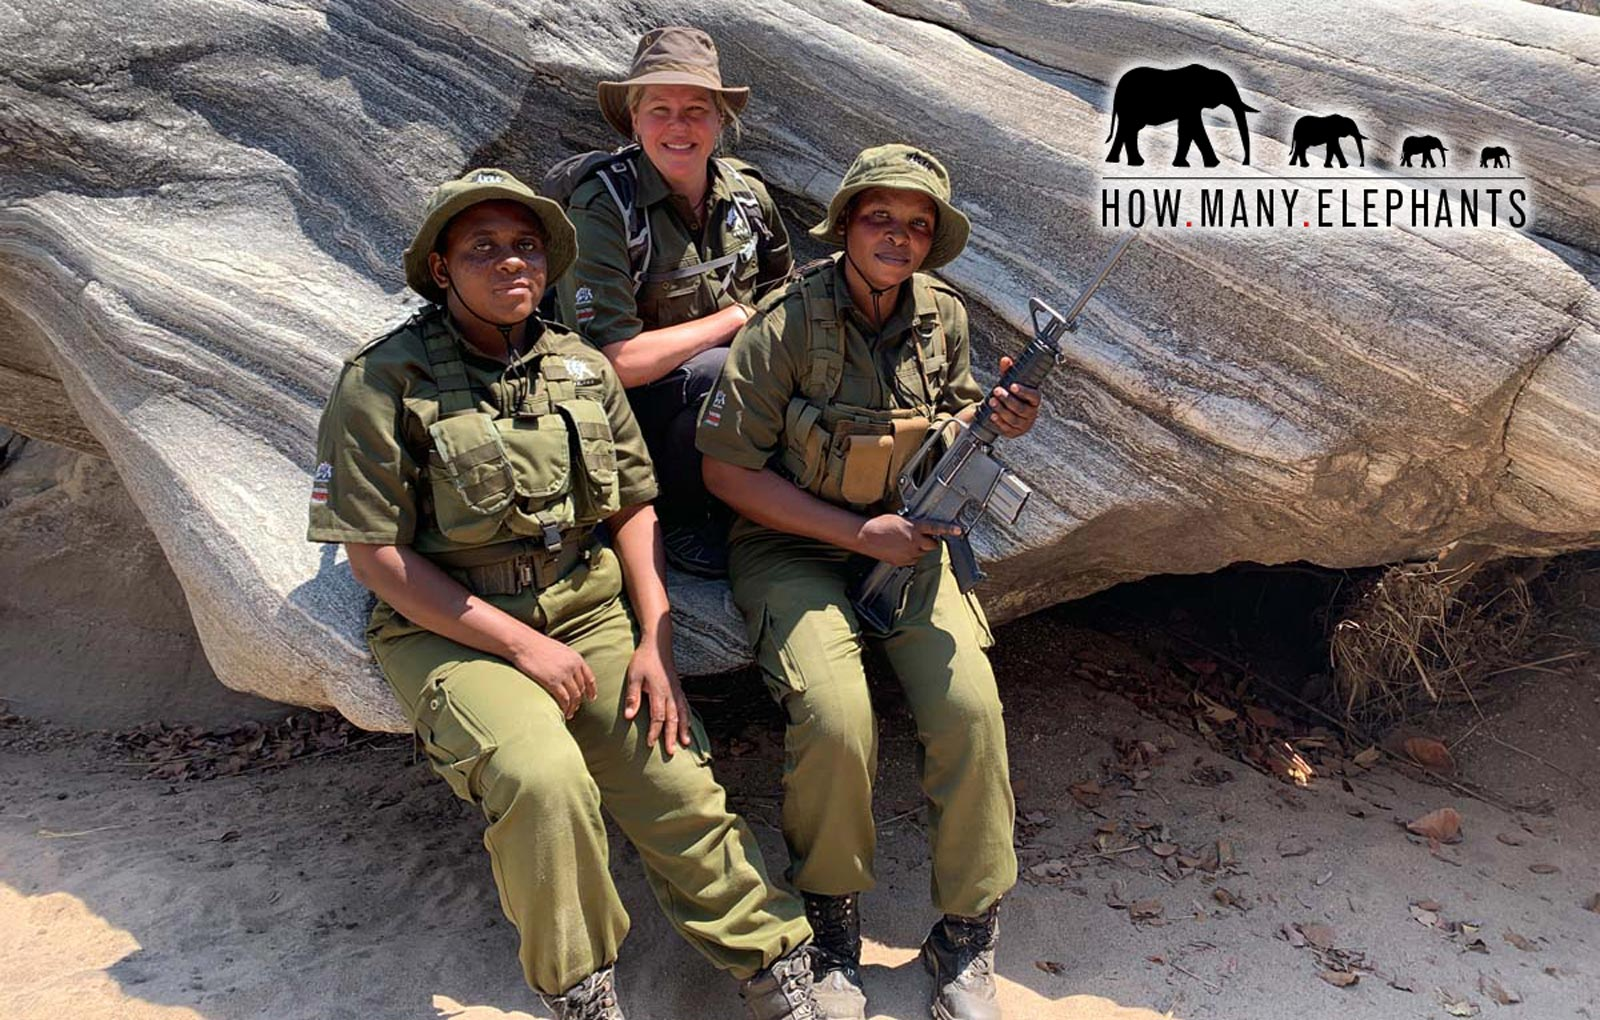 Holly Budge - How Many Elephants